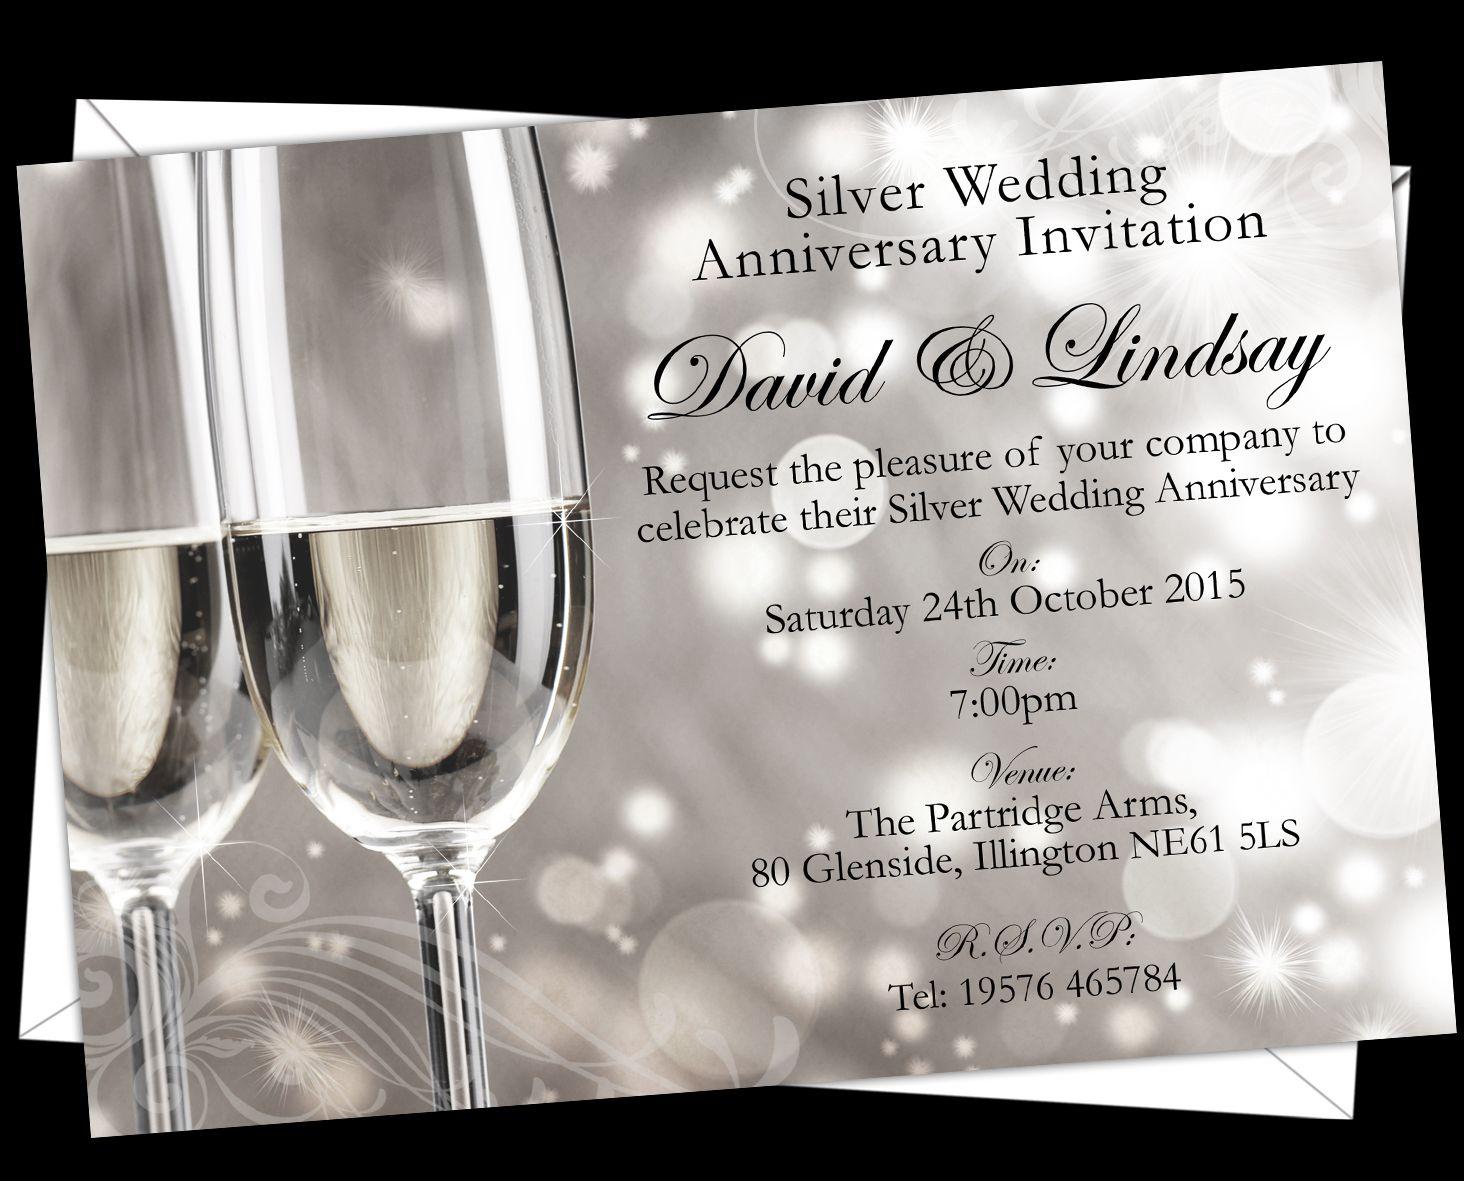 Personalised Silver Wedding Anniversary Invitations